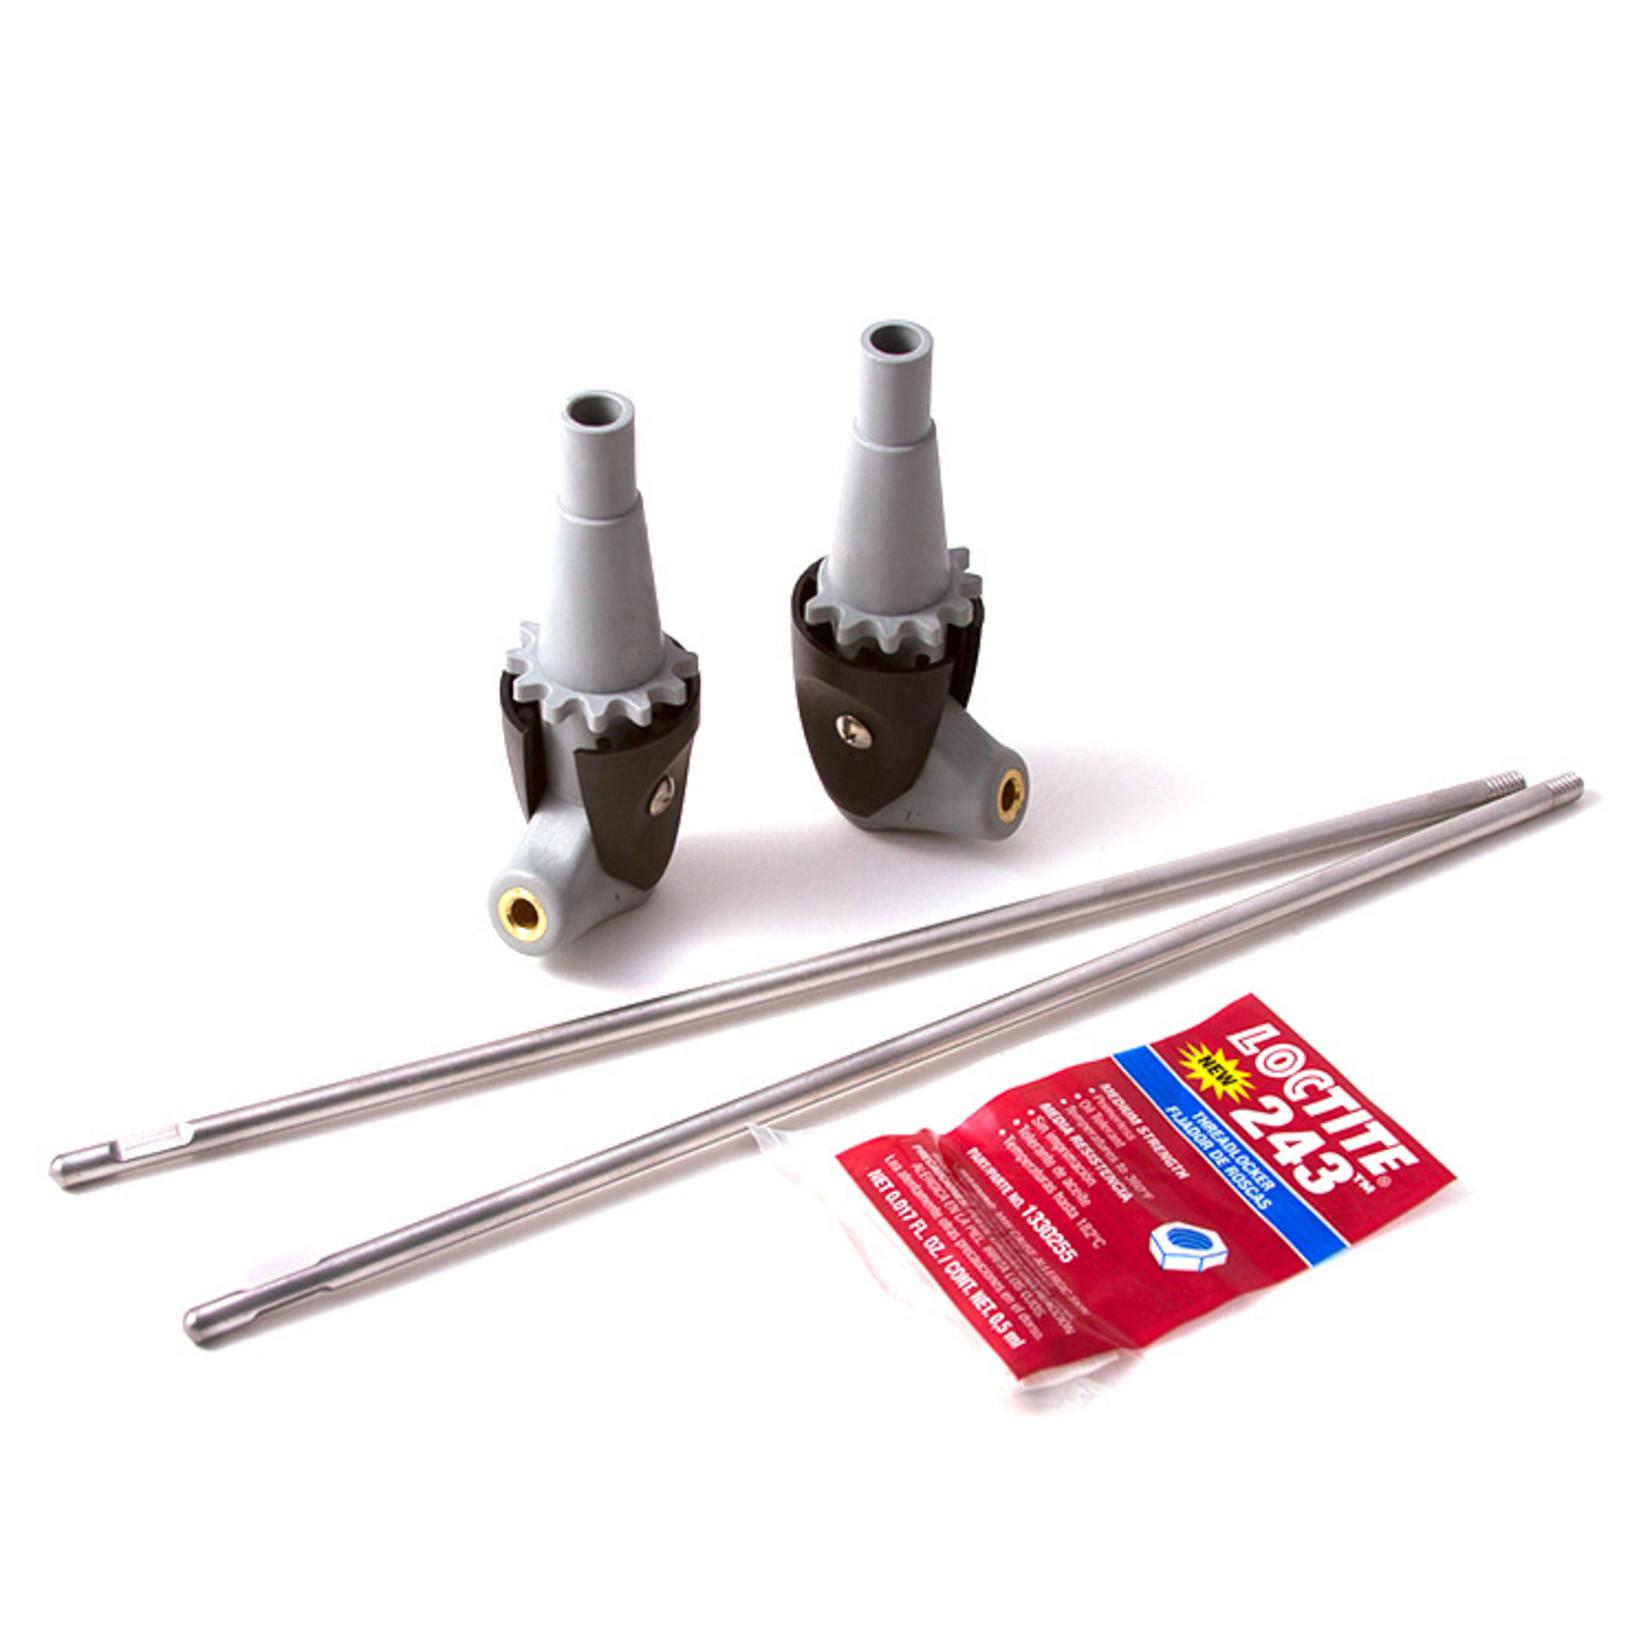 Hobie Gtt Sprocket / Mast Kit Turbo